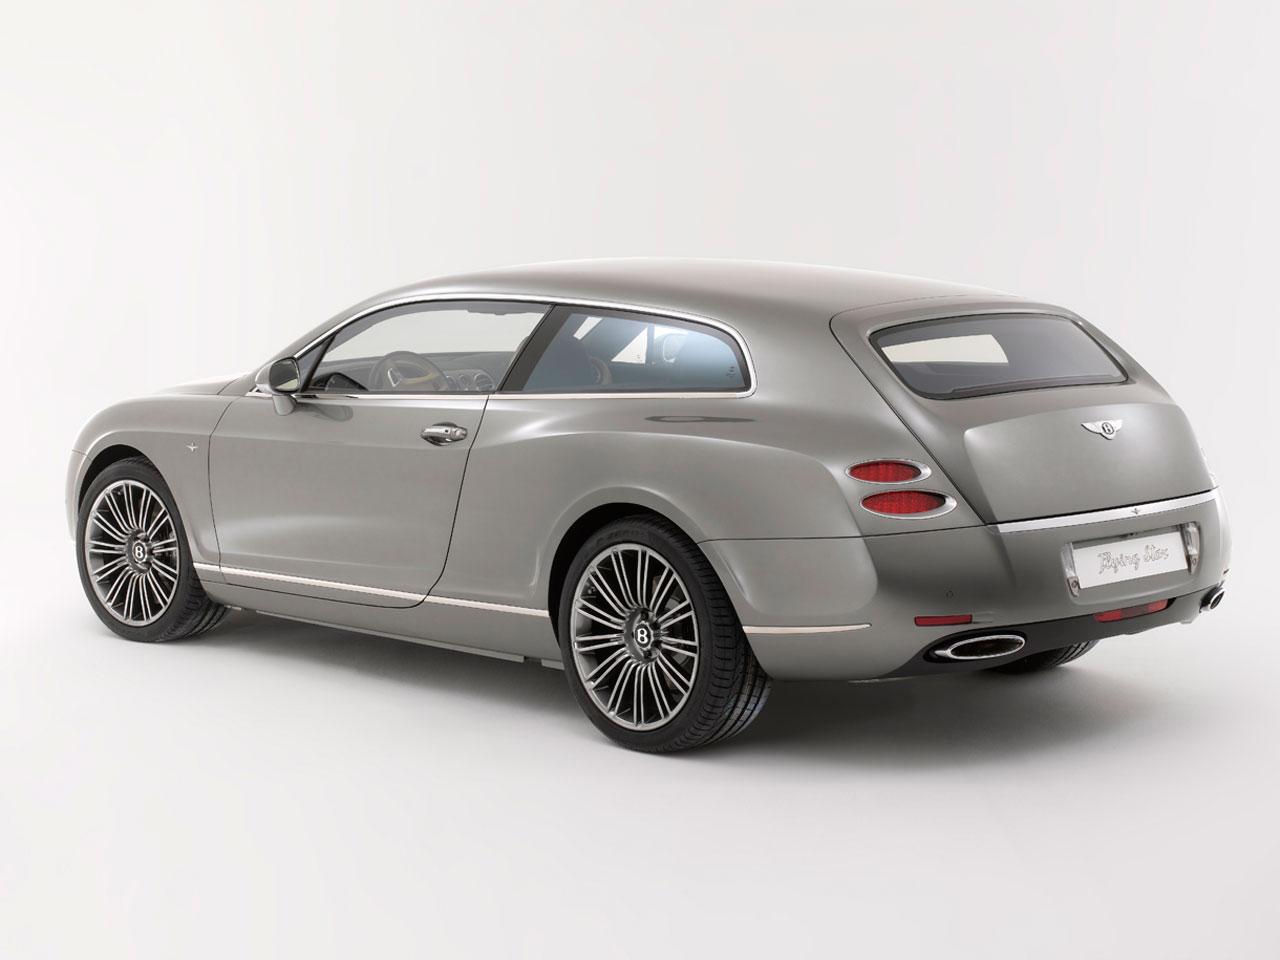 2010 Bentley Continental Flying Star Touring Studios